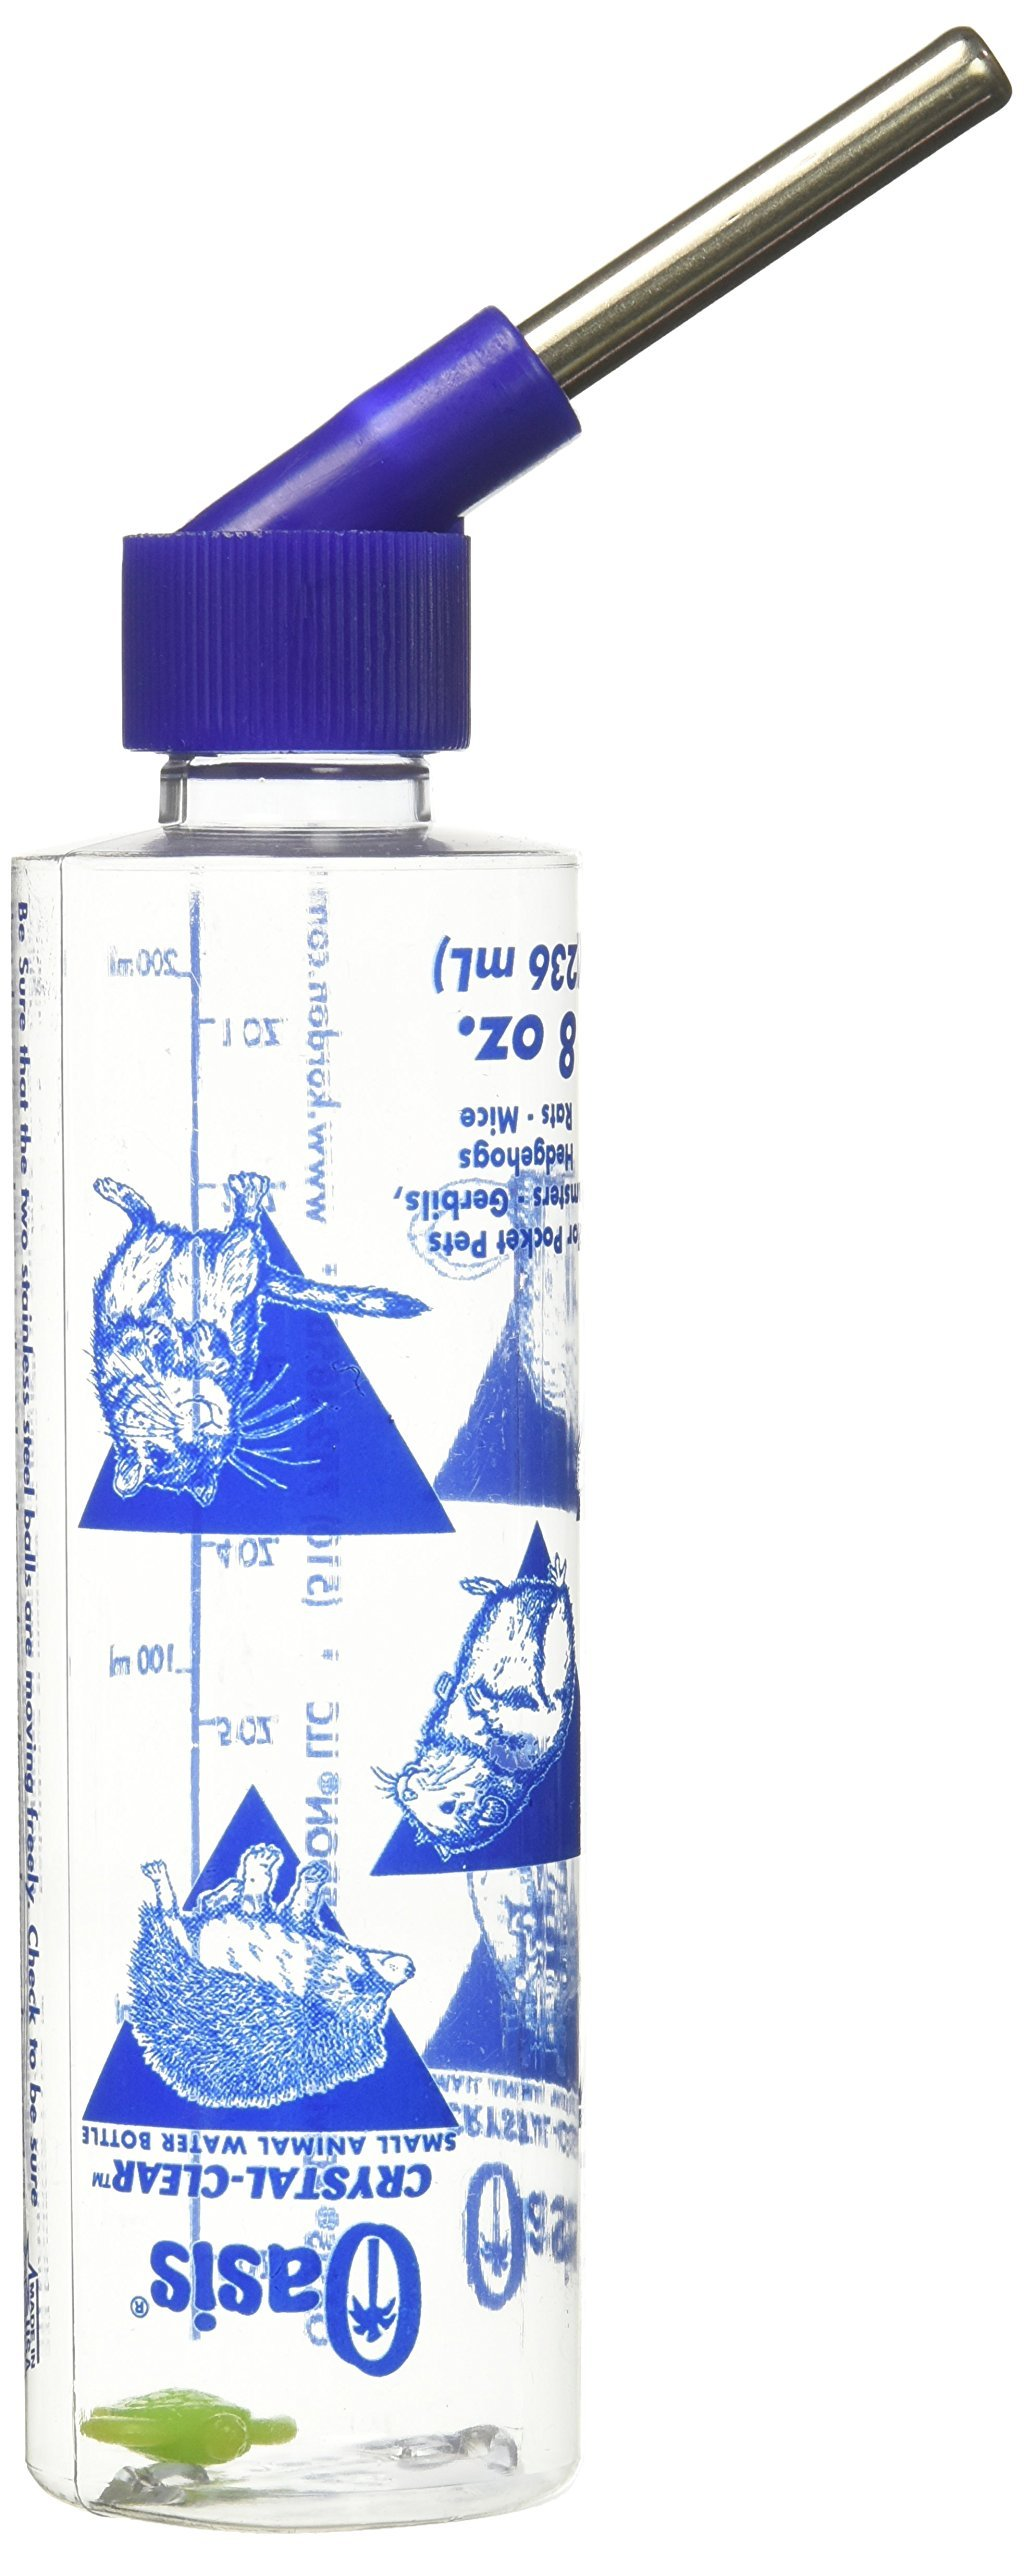 OASIS  # 80500  Hamster Water Bottle, 8-Ounce, Clear